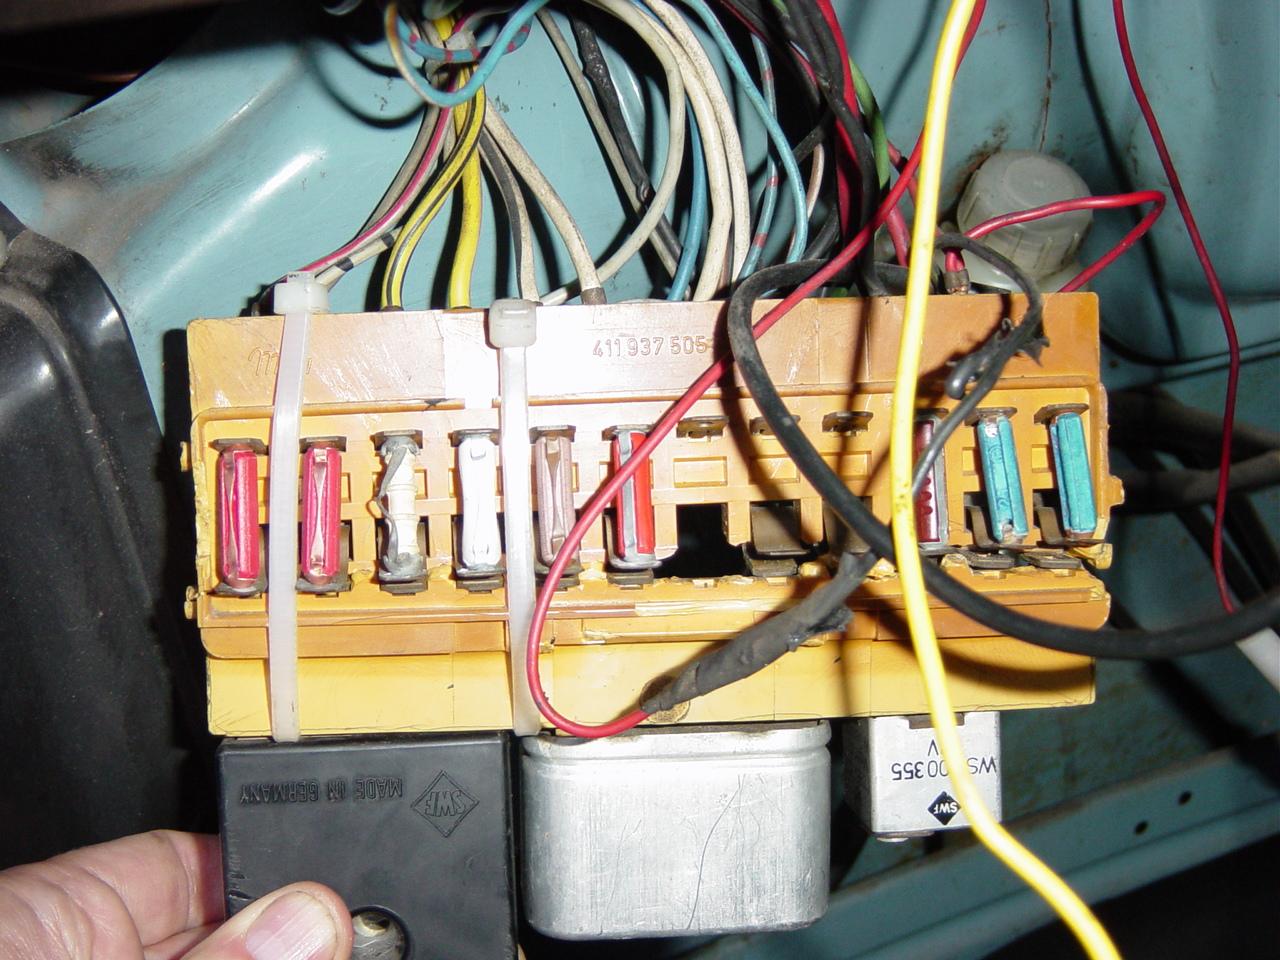 [SCHEMATICS_4JK]  1969 Vw Bus Fuse Box Wiring Diagram For Kawasaki Z1 -  hazzard.jambu.astrea-construction.fr | Vw Bus Fuse Box |  | Begeboy Wiring Diagram Source - astrea-construction.fr